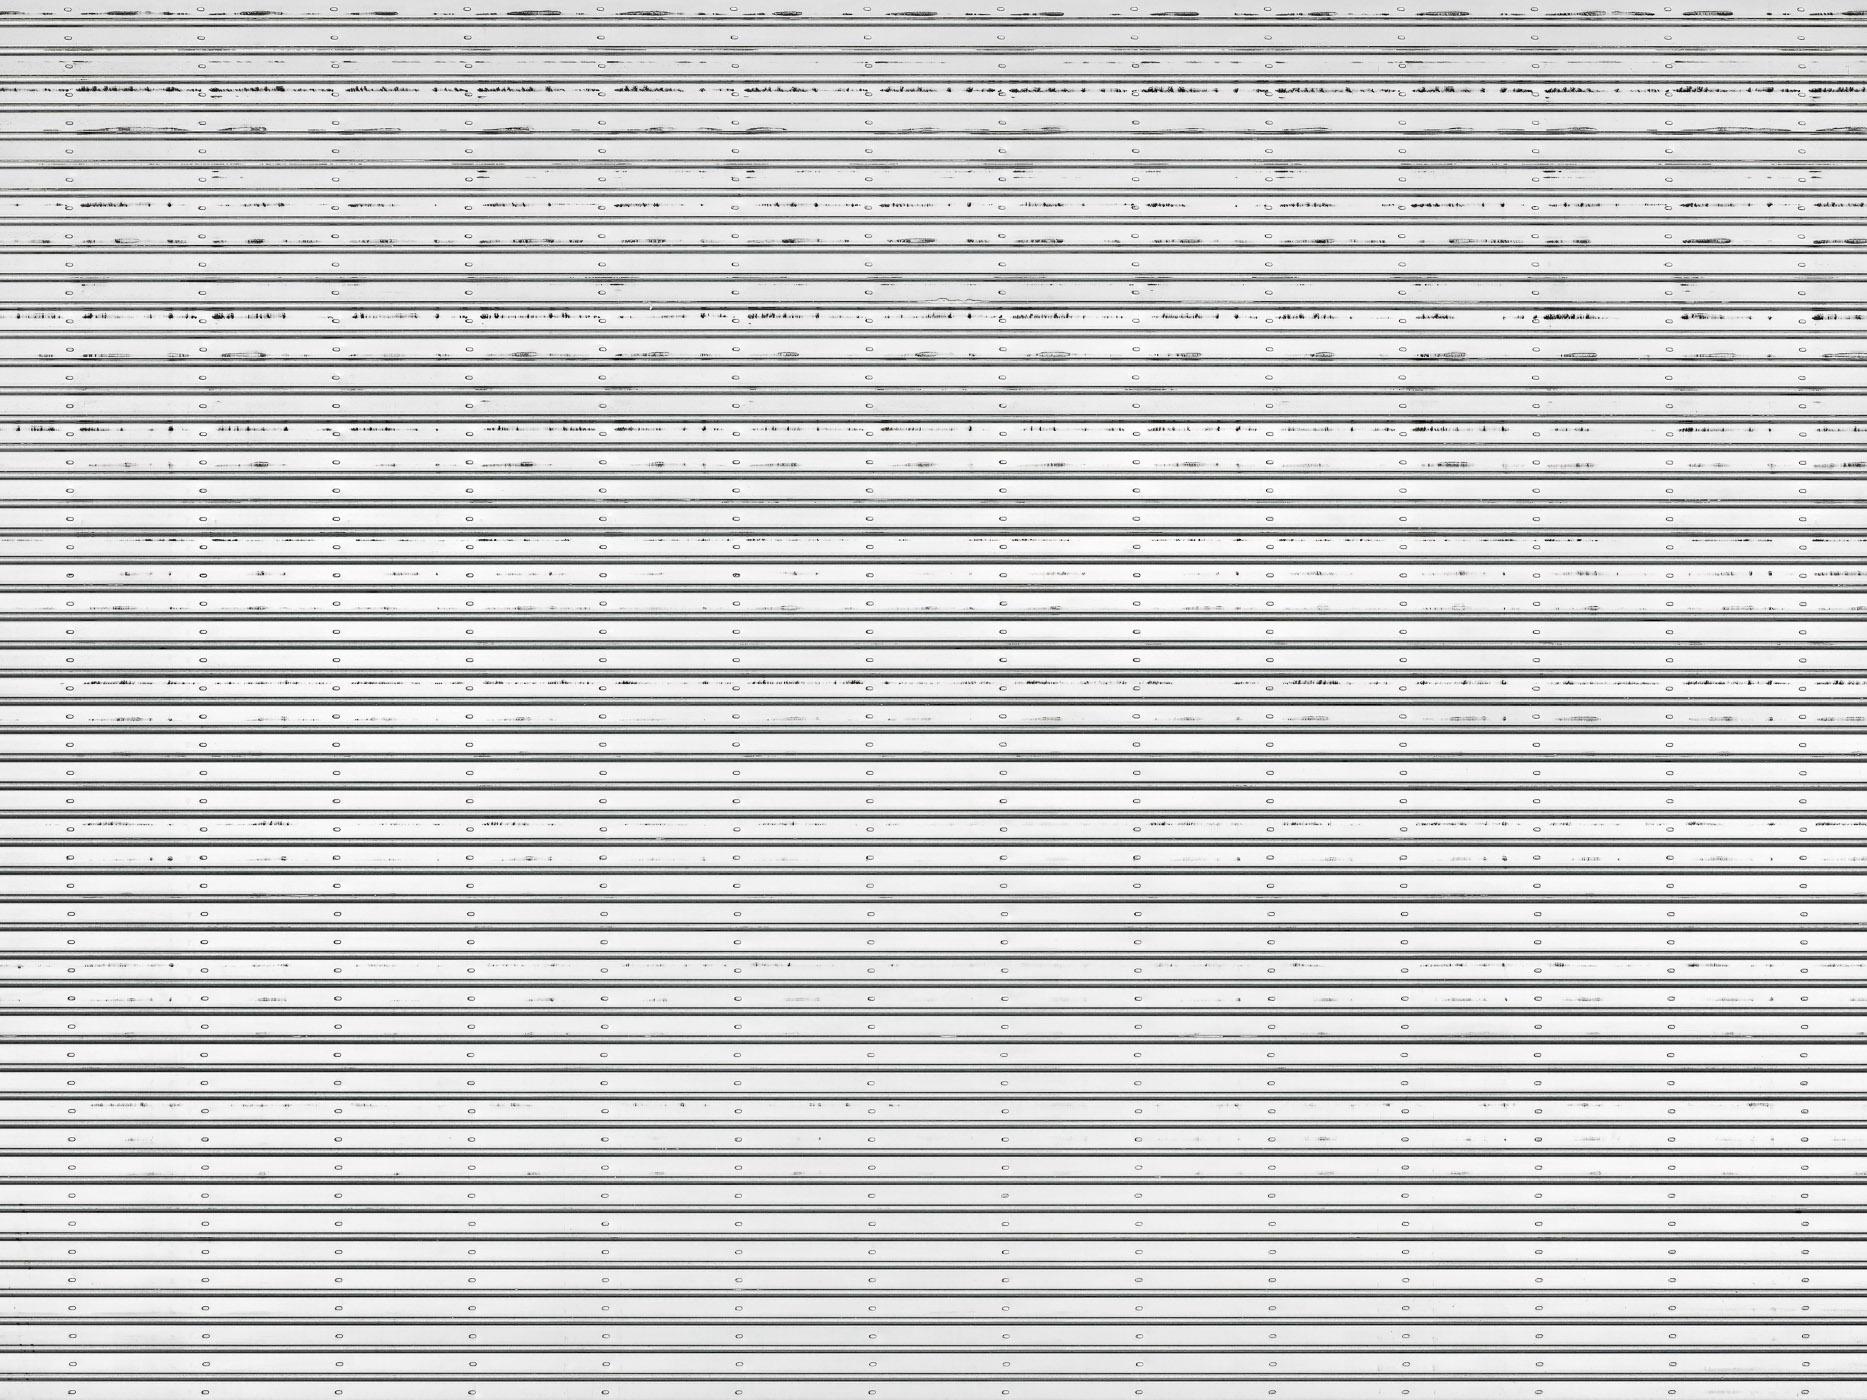 069-types-of-construction_020.jpg